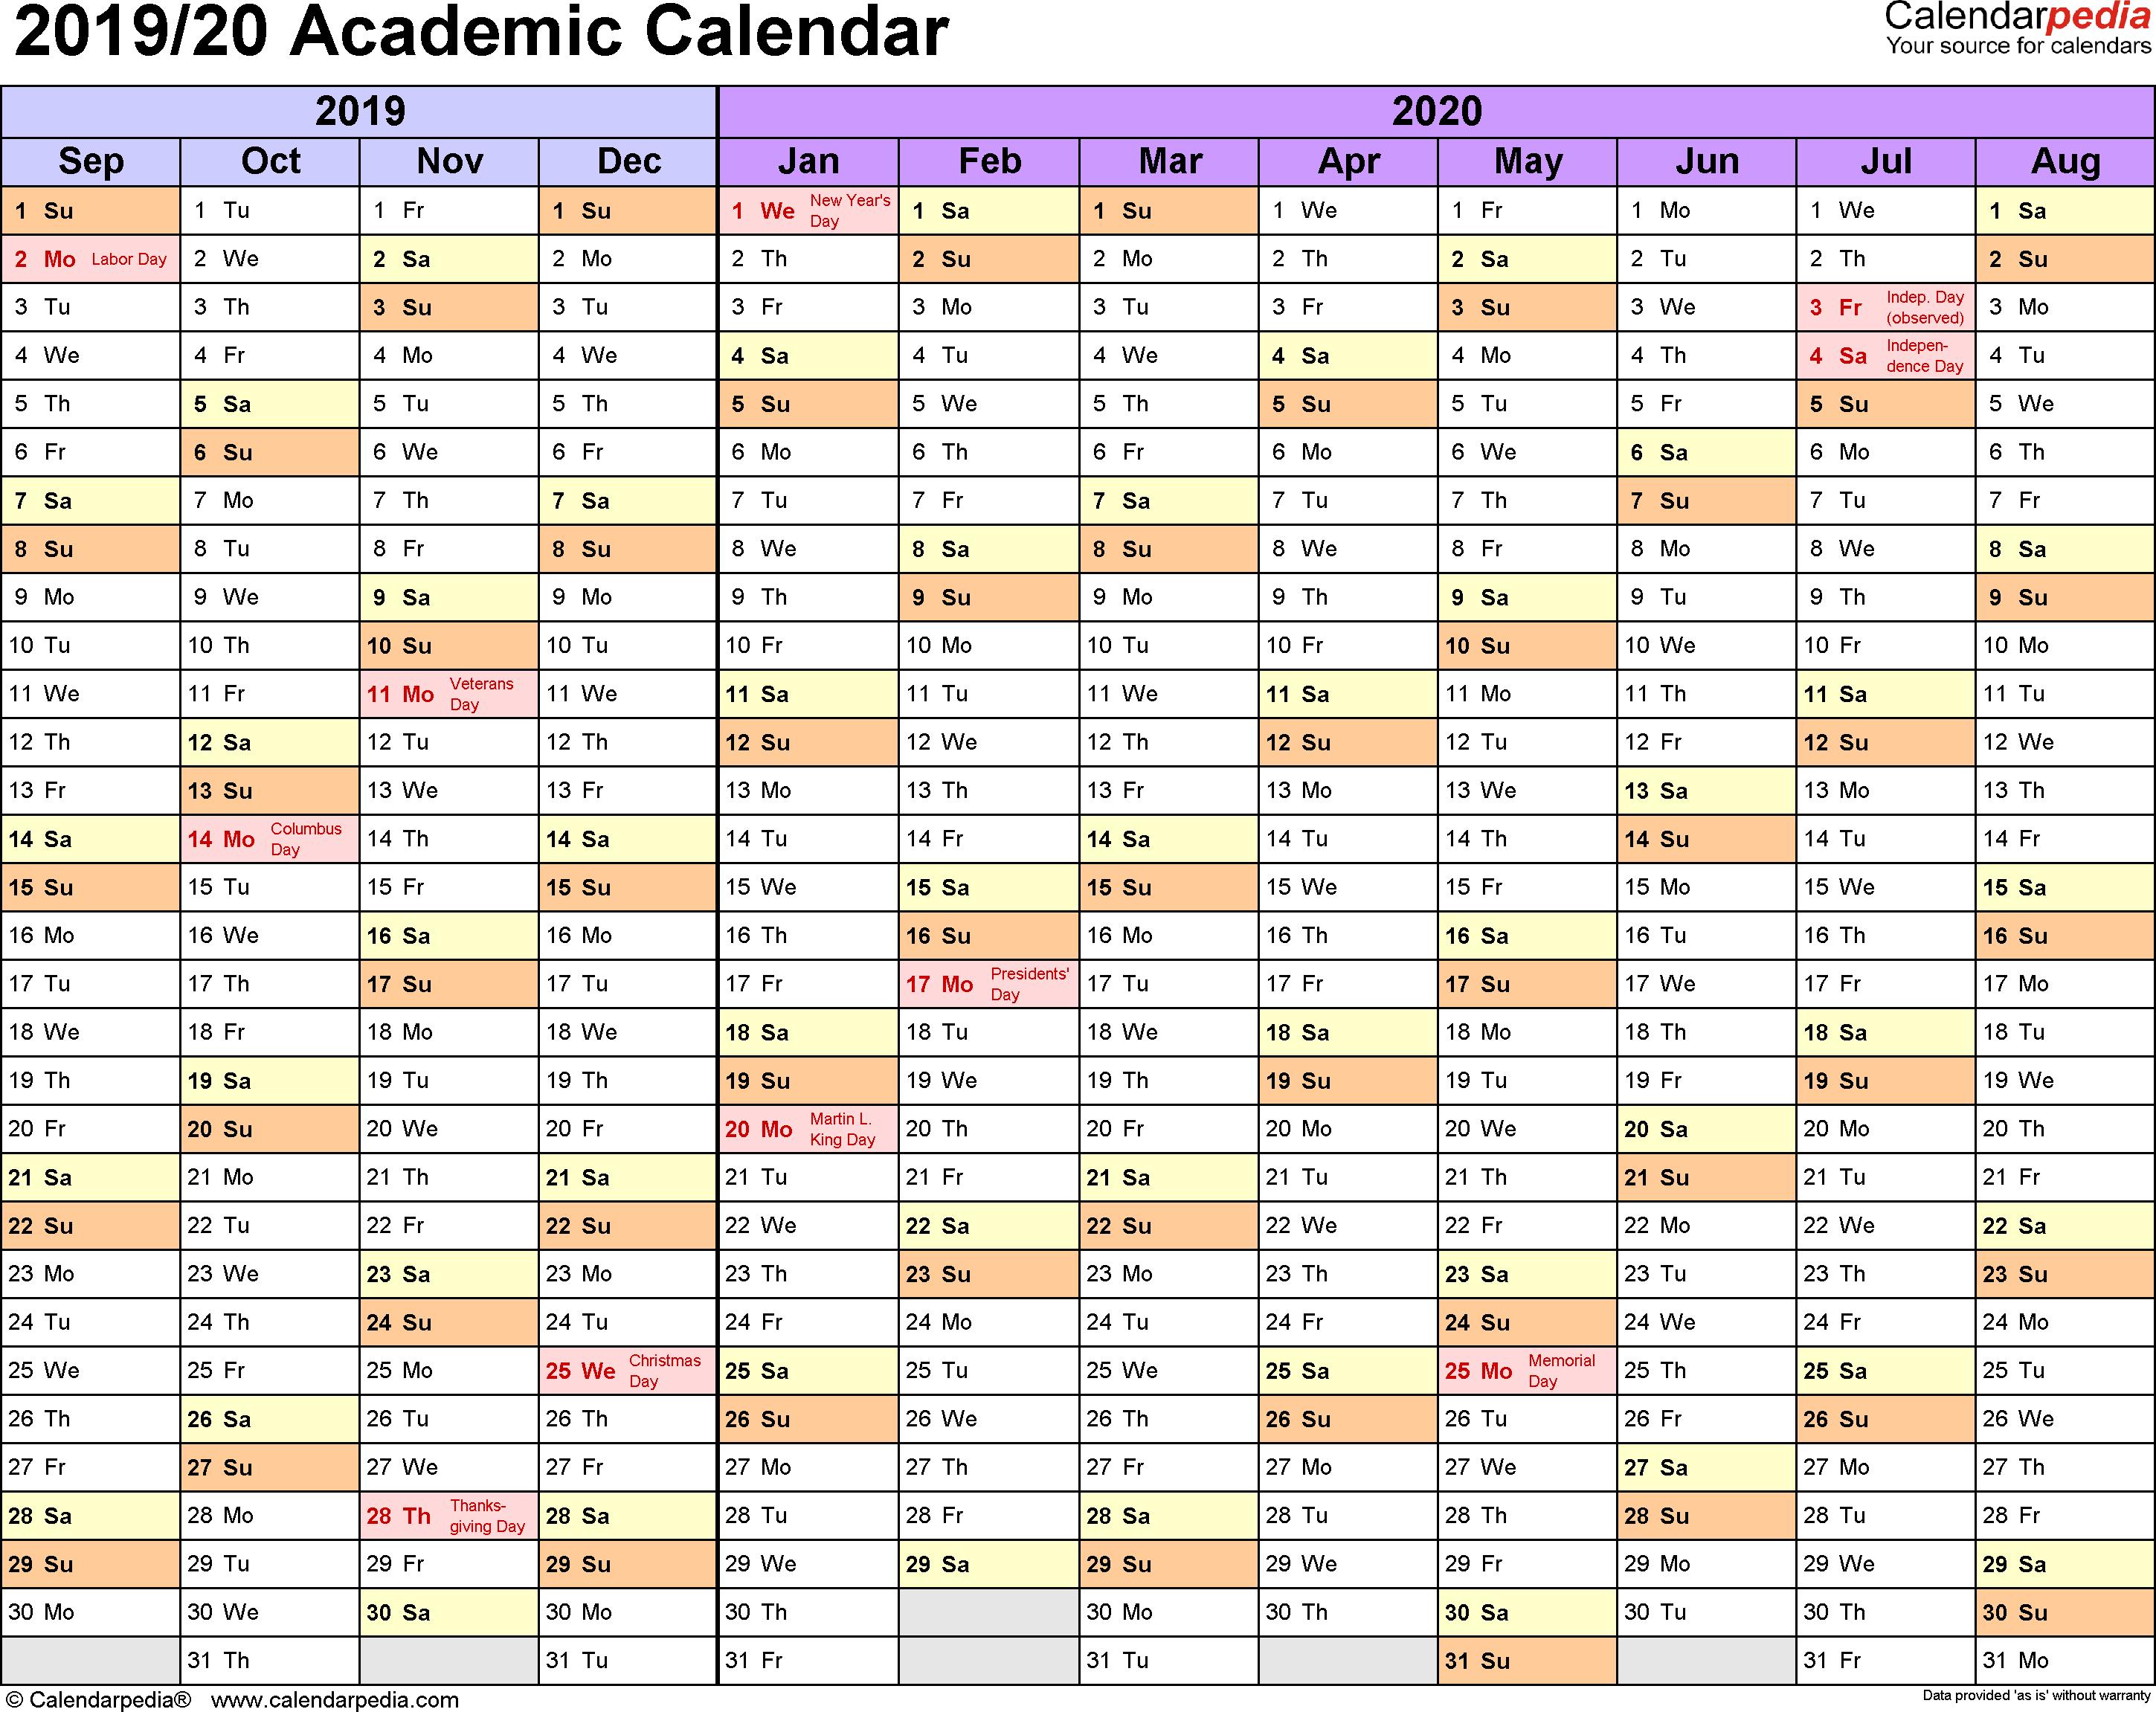 Academic Calendars 2019/2020 - Free Printable Excel Templates throughout Canadian Printable Academic Calendar 2019-2020